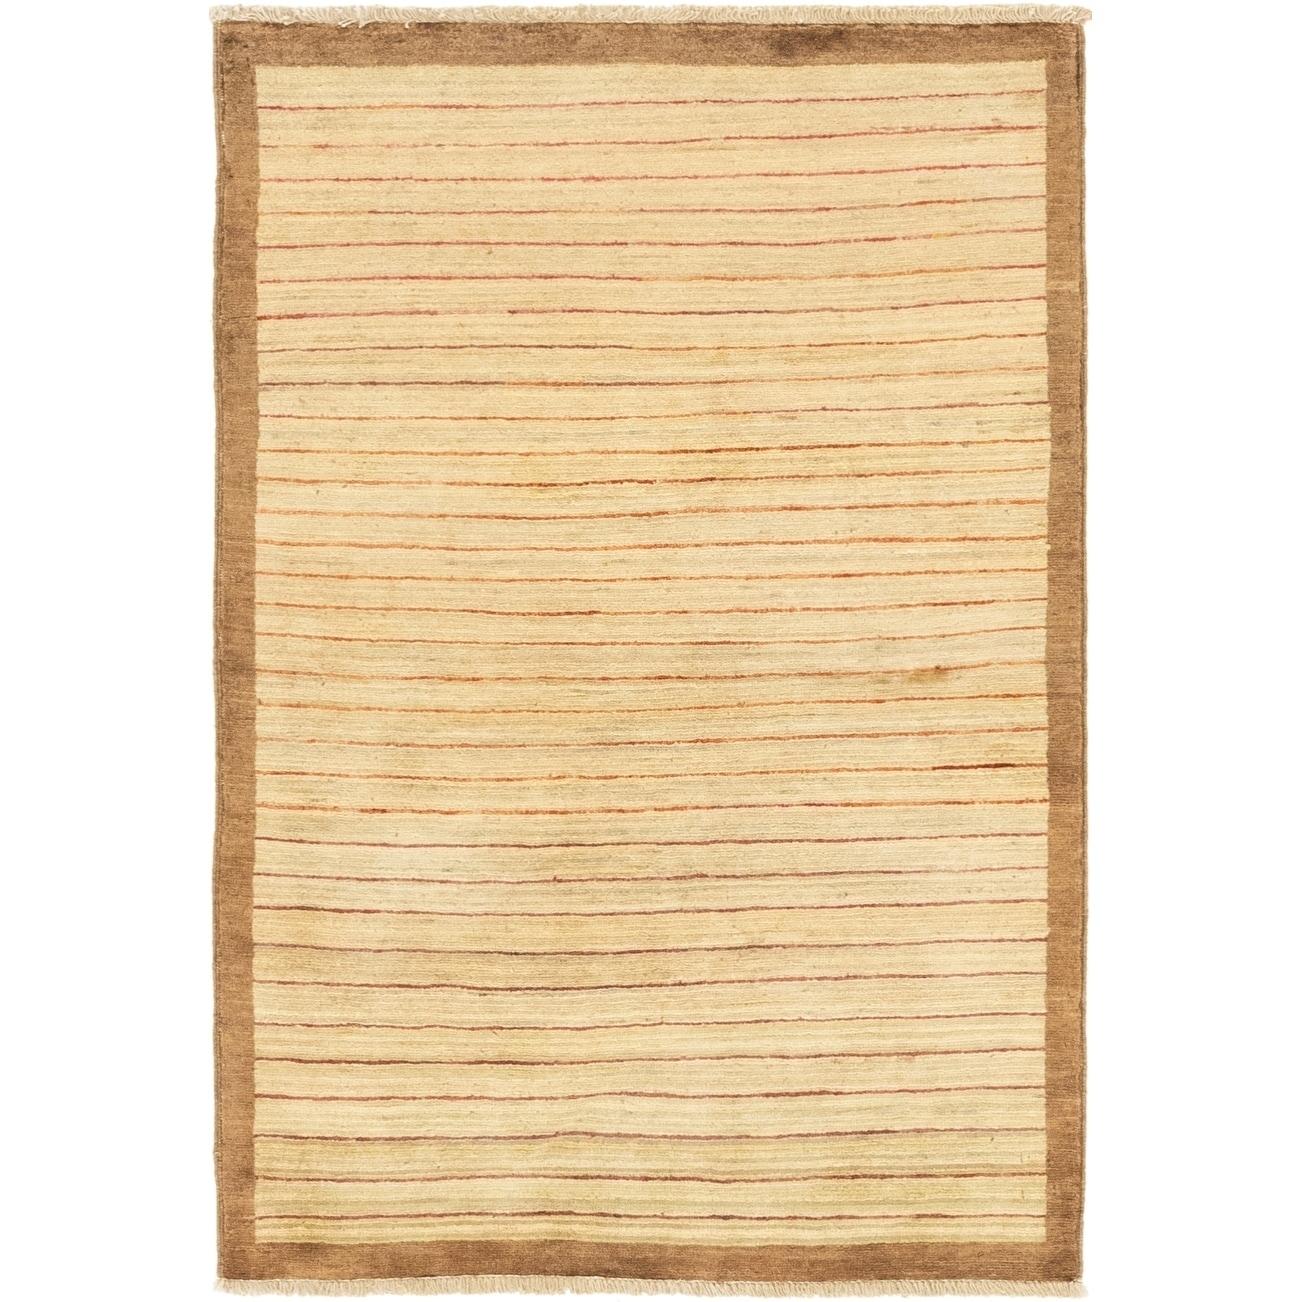 Hand Knotted Kashkuli Gabbeh Wool Area Rug - 3 2 x 4 9 (Beige - 3 2 x 4 9)